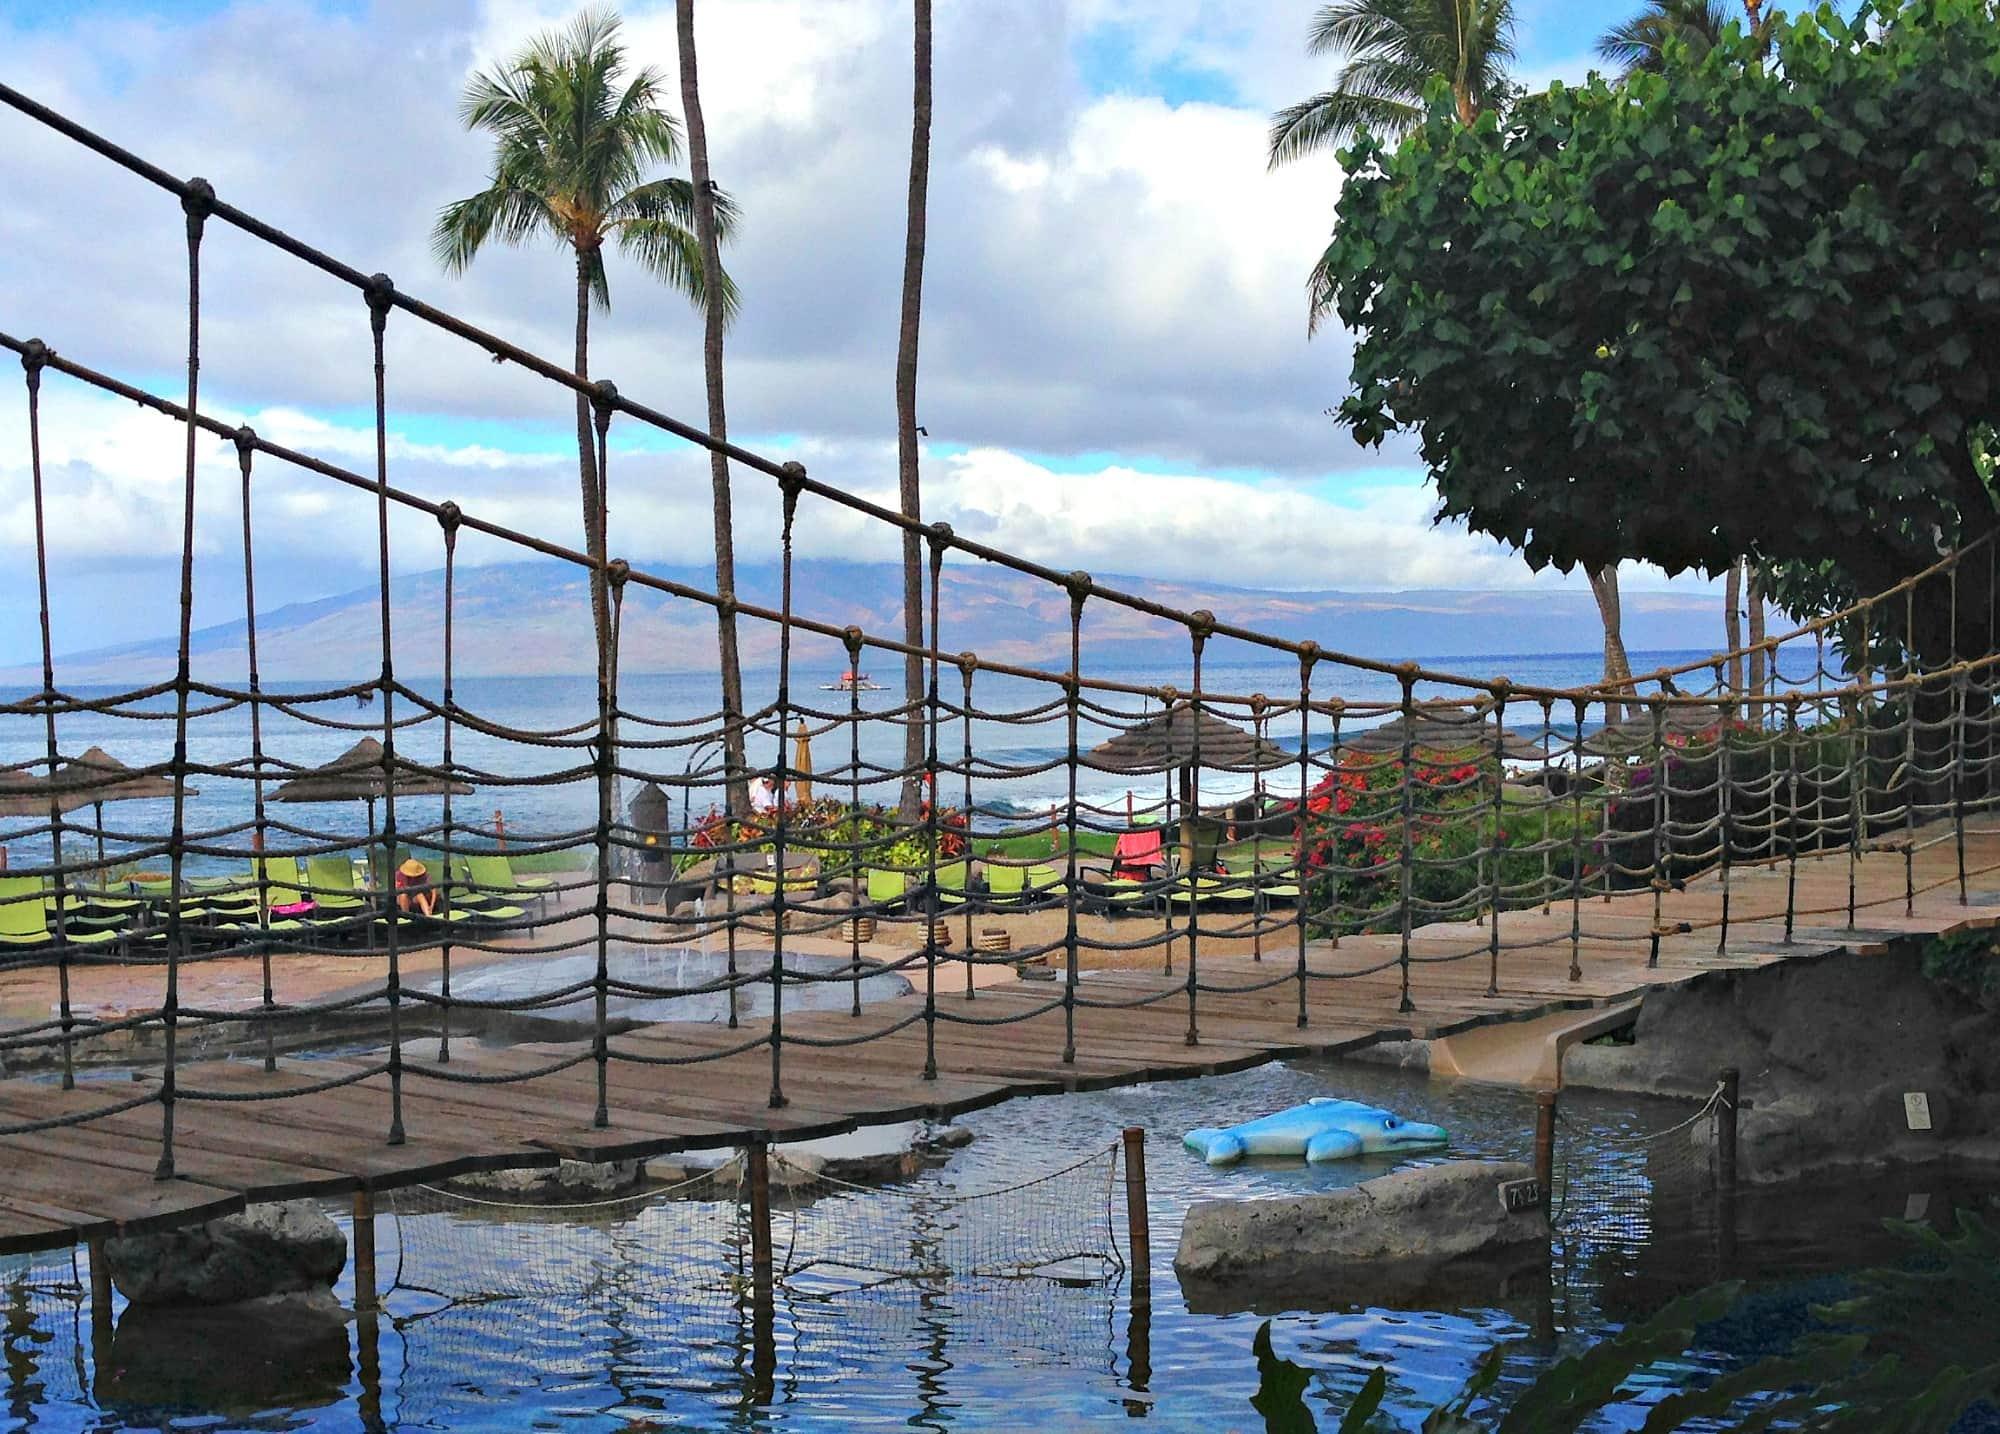 Hyatt Regency Maui Keiki Lagoon